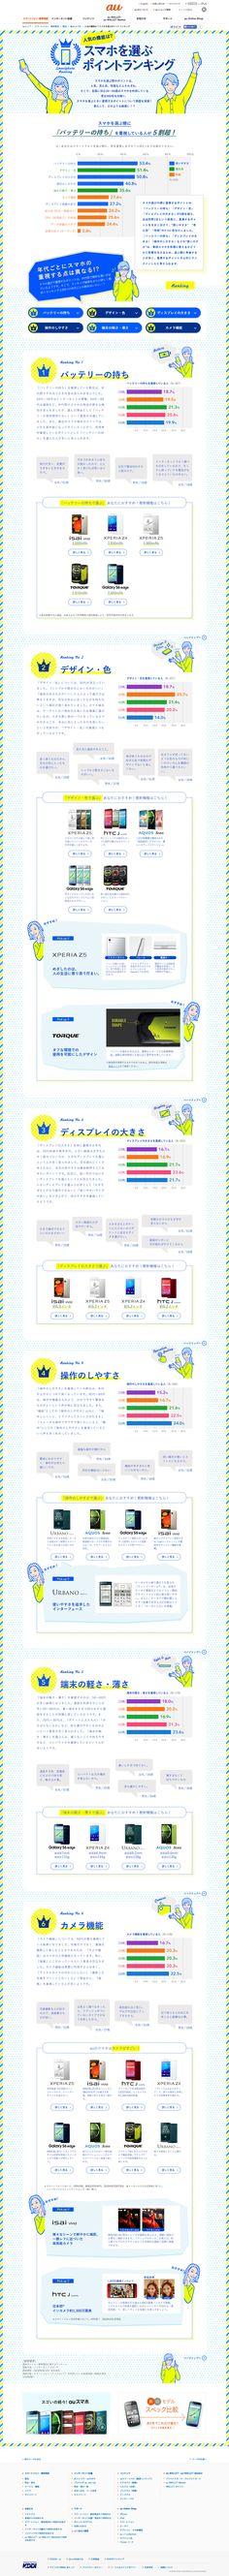 http://www.au.kddi.com/mobile/product/selection/ranking/?bid=we-we-prtpsd-0004